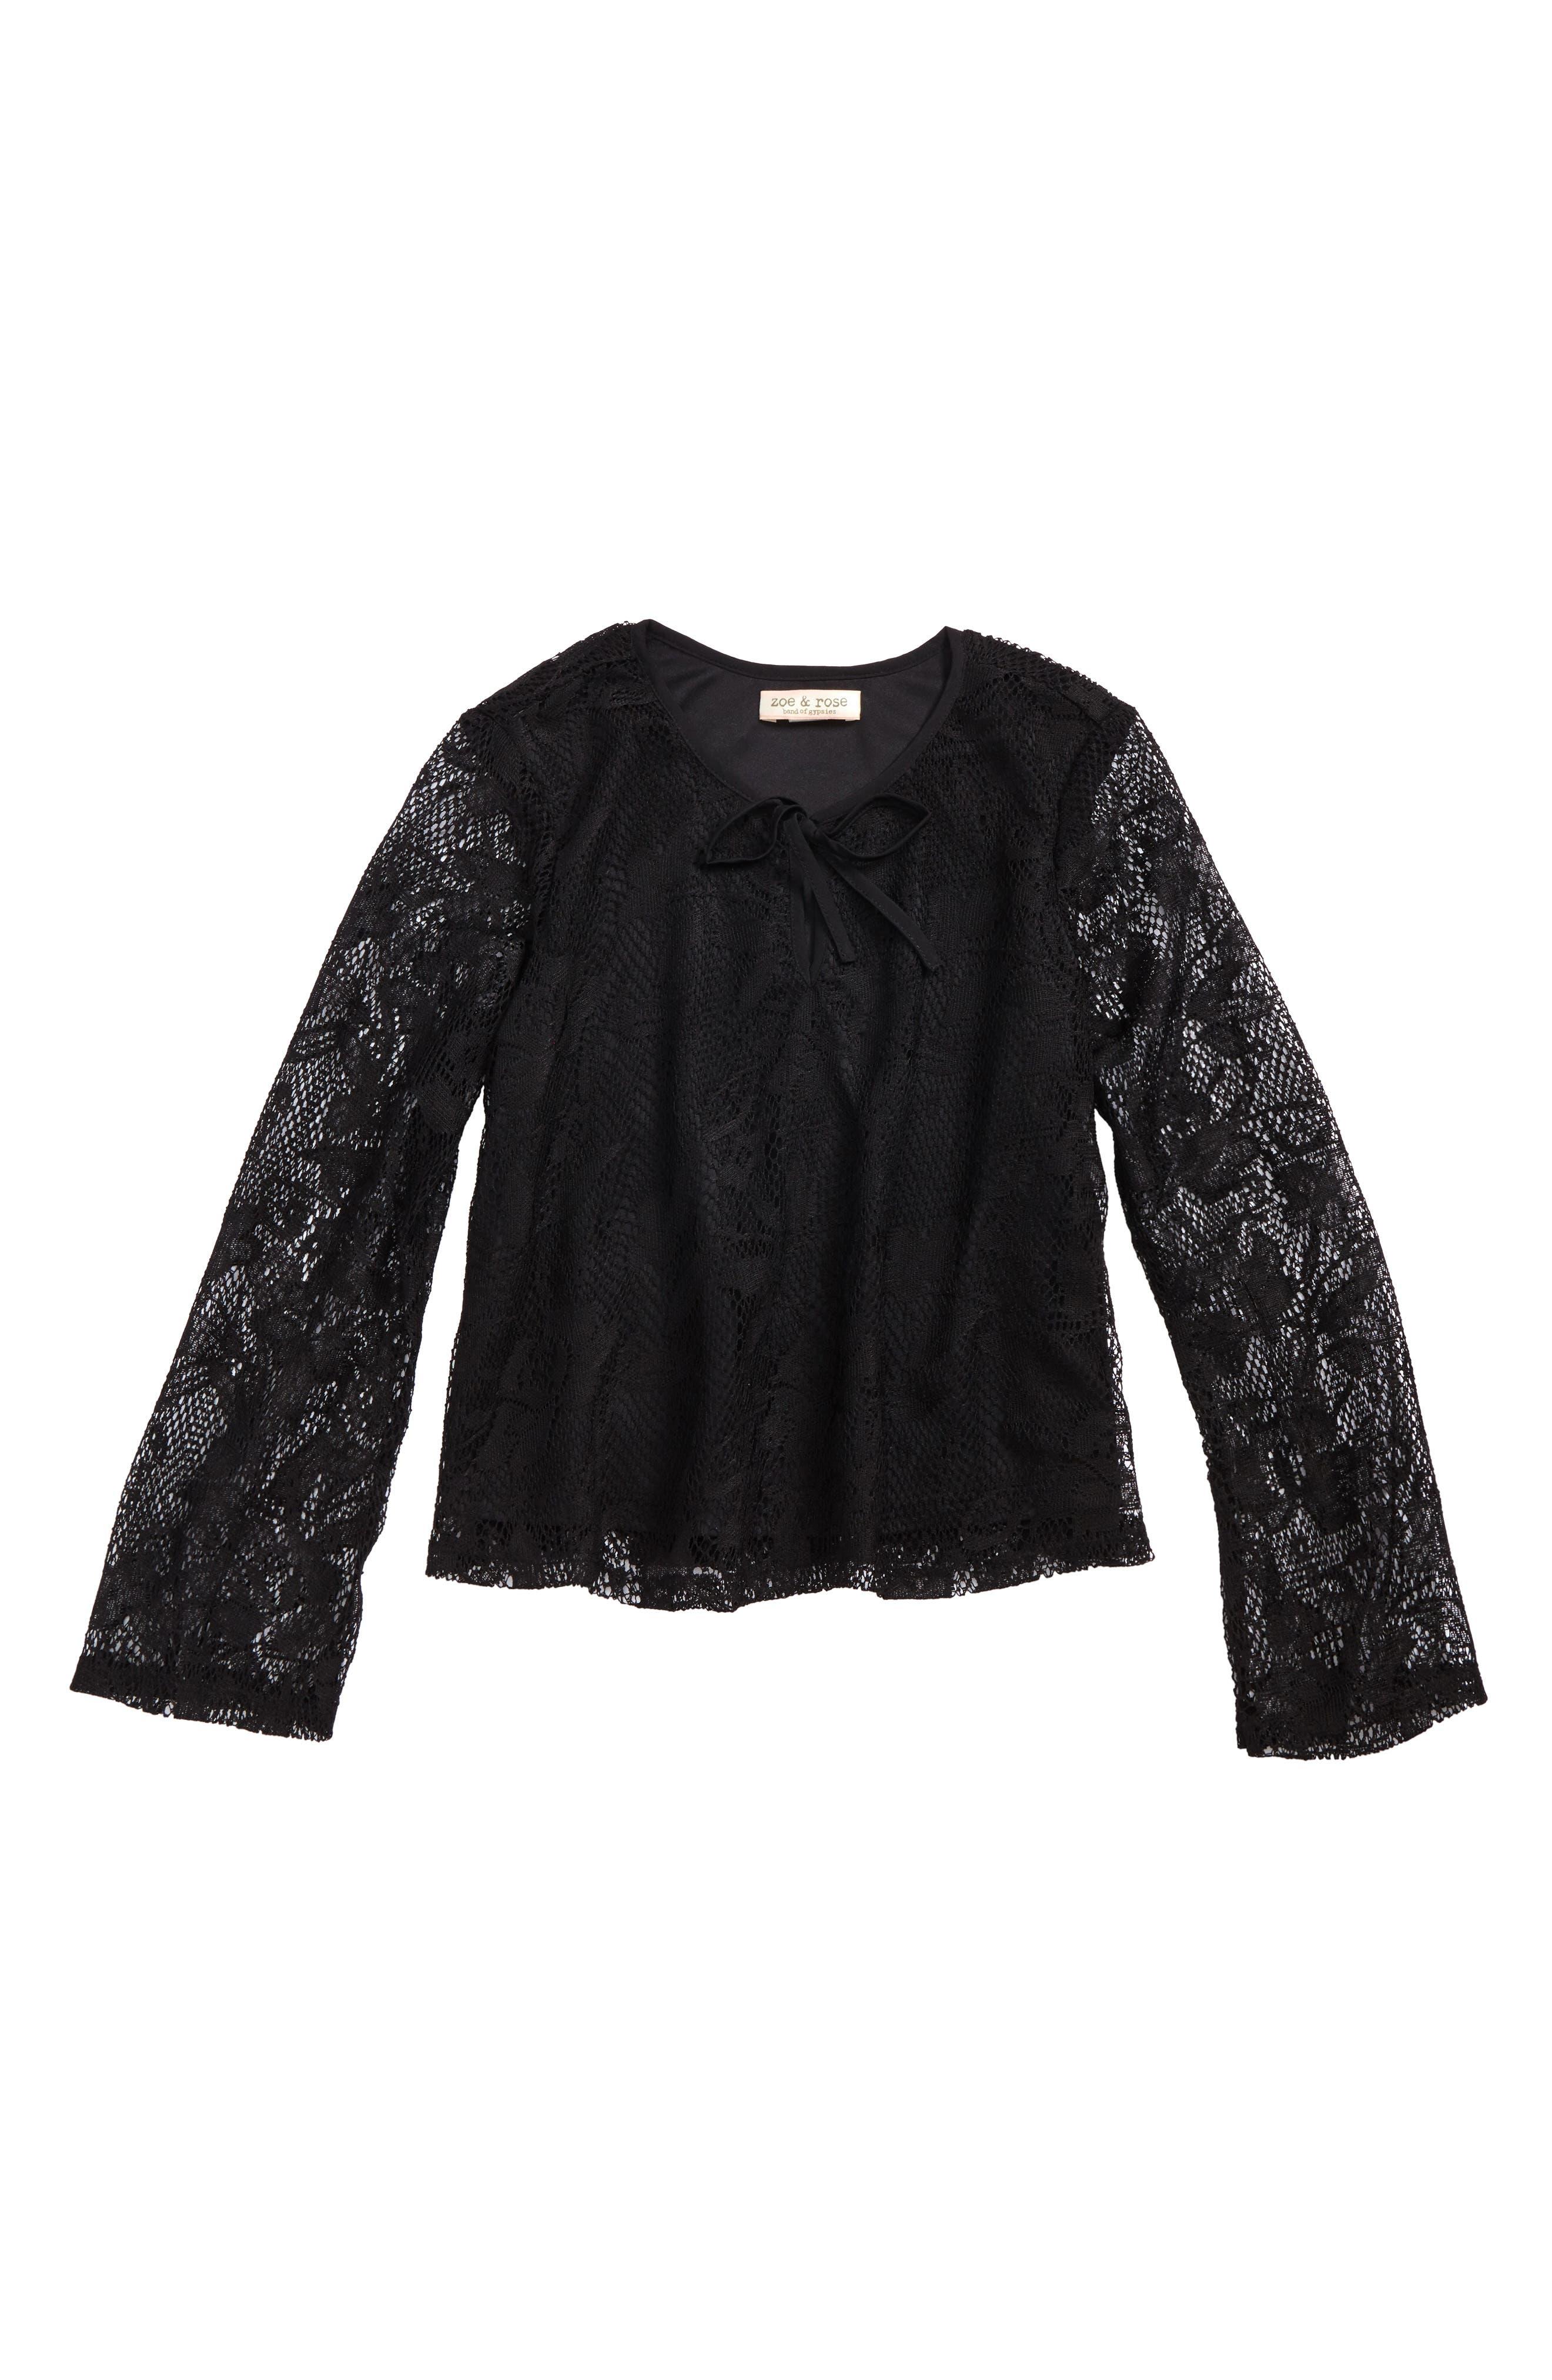 Zoe & Rose Lace Flare Sleeve Blouse,                         Main,                         color, Black